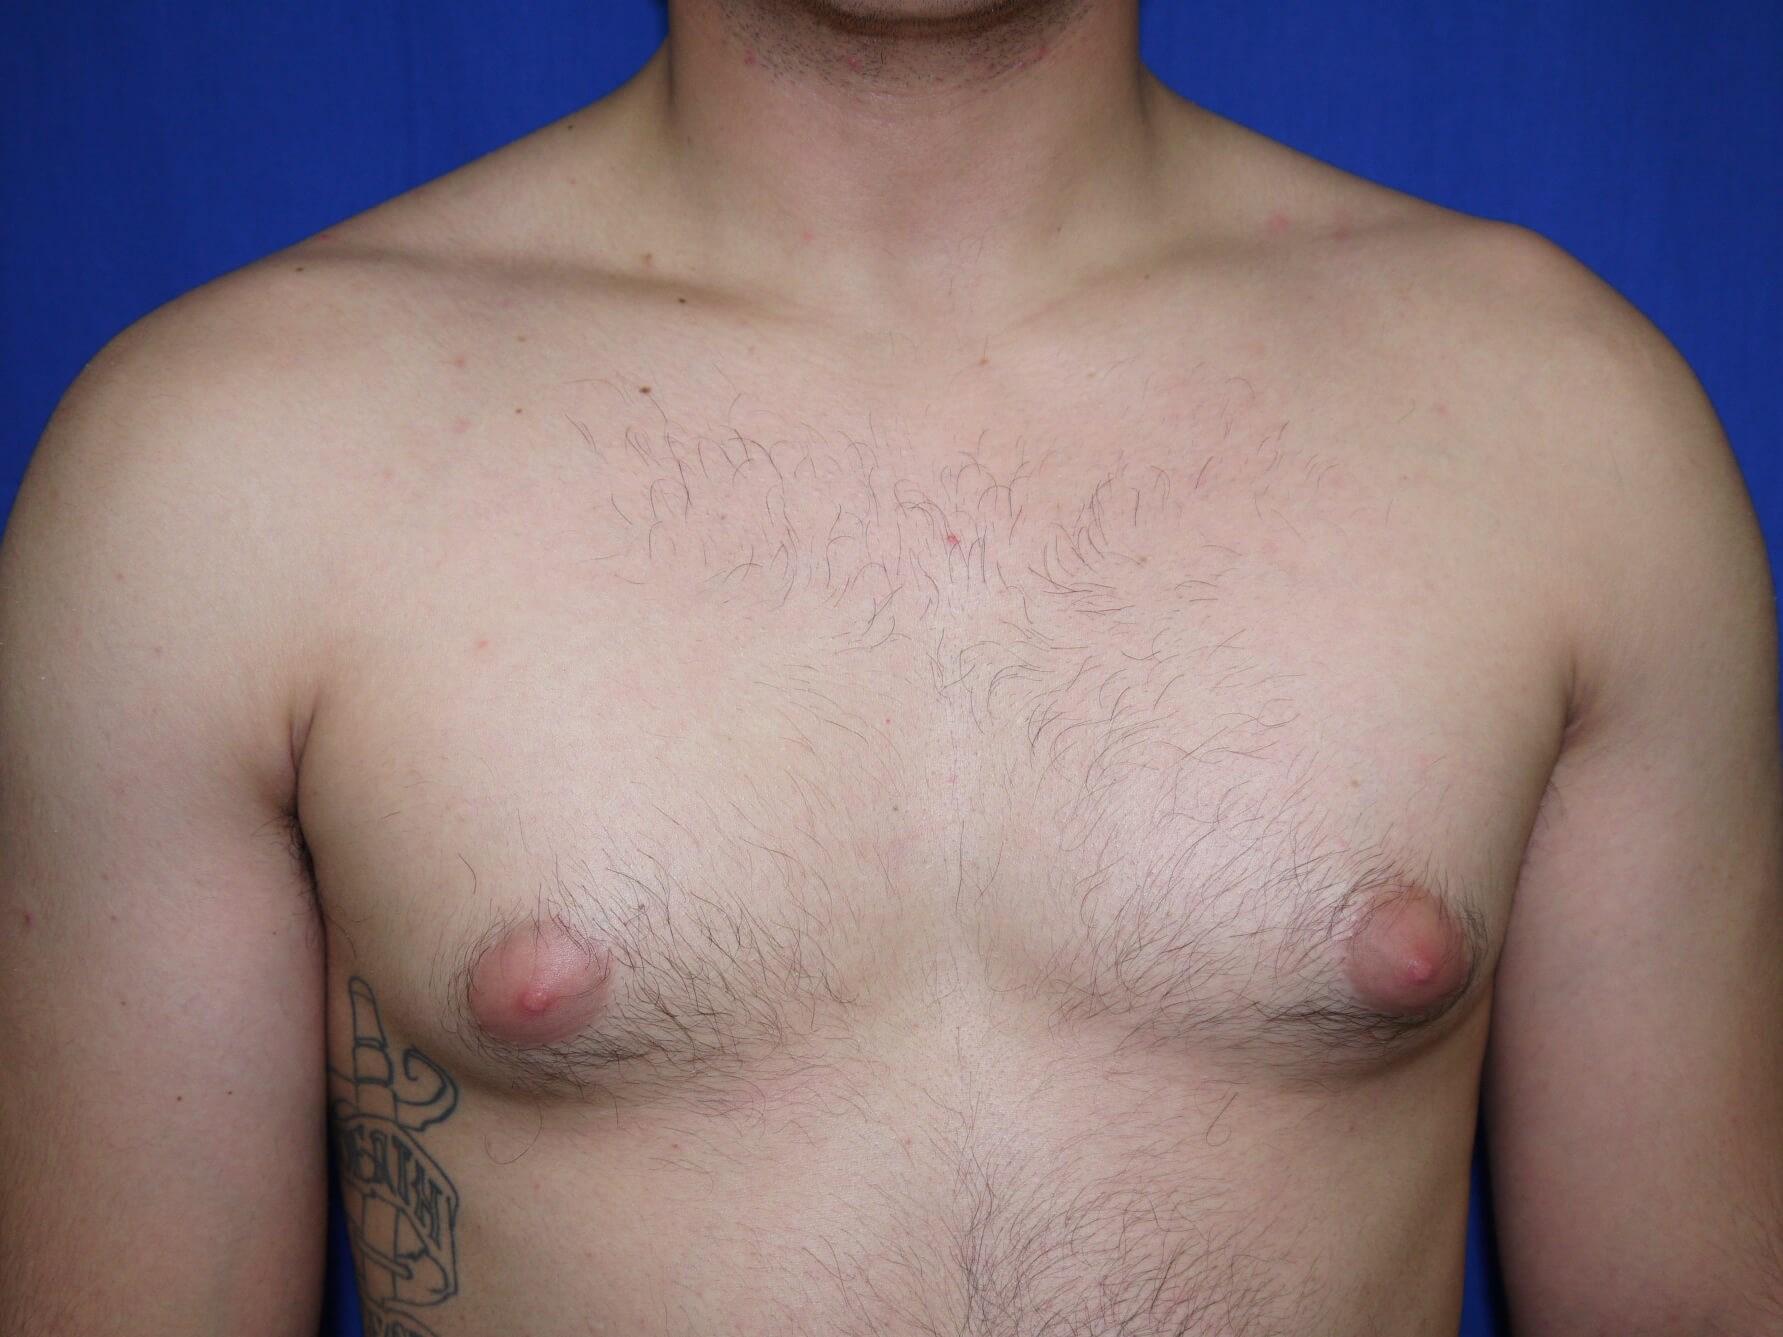 One Stitch Gynecomastia Before - Dr Mata